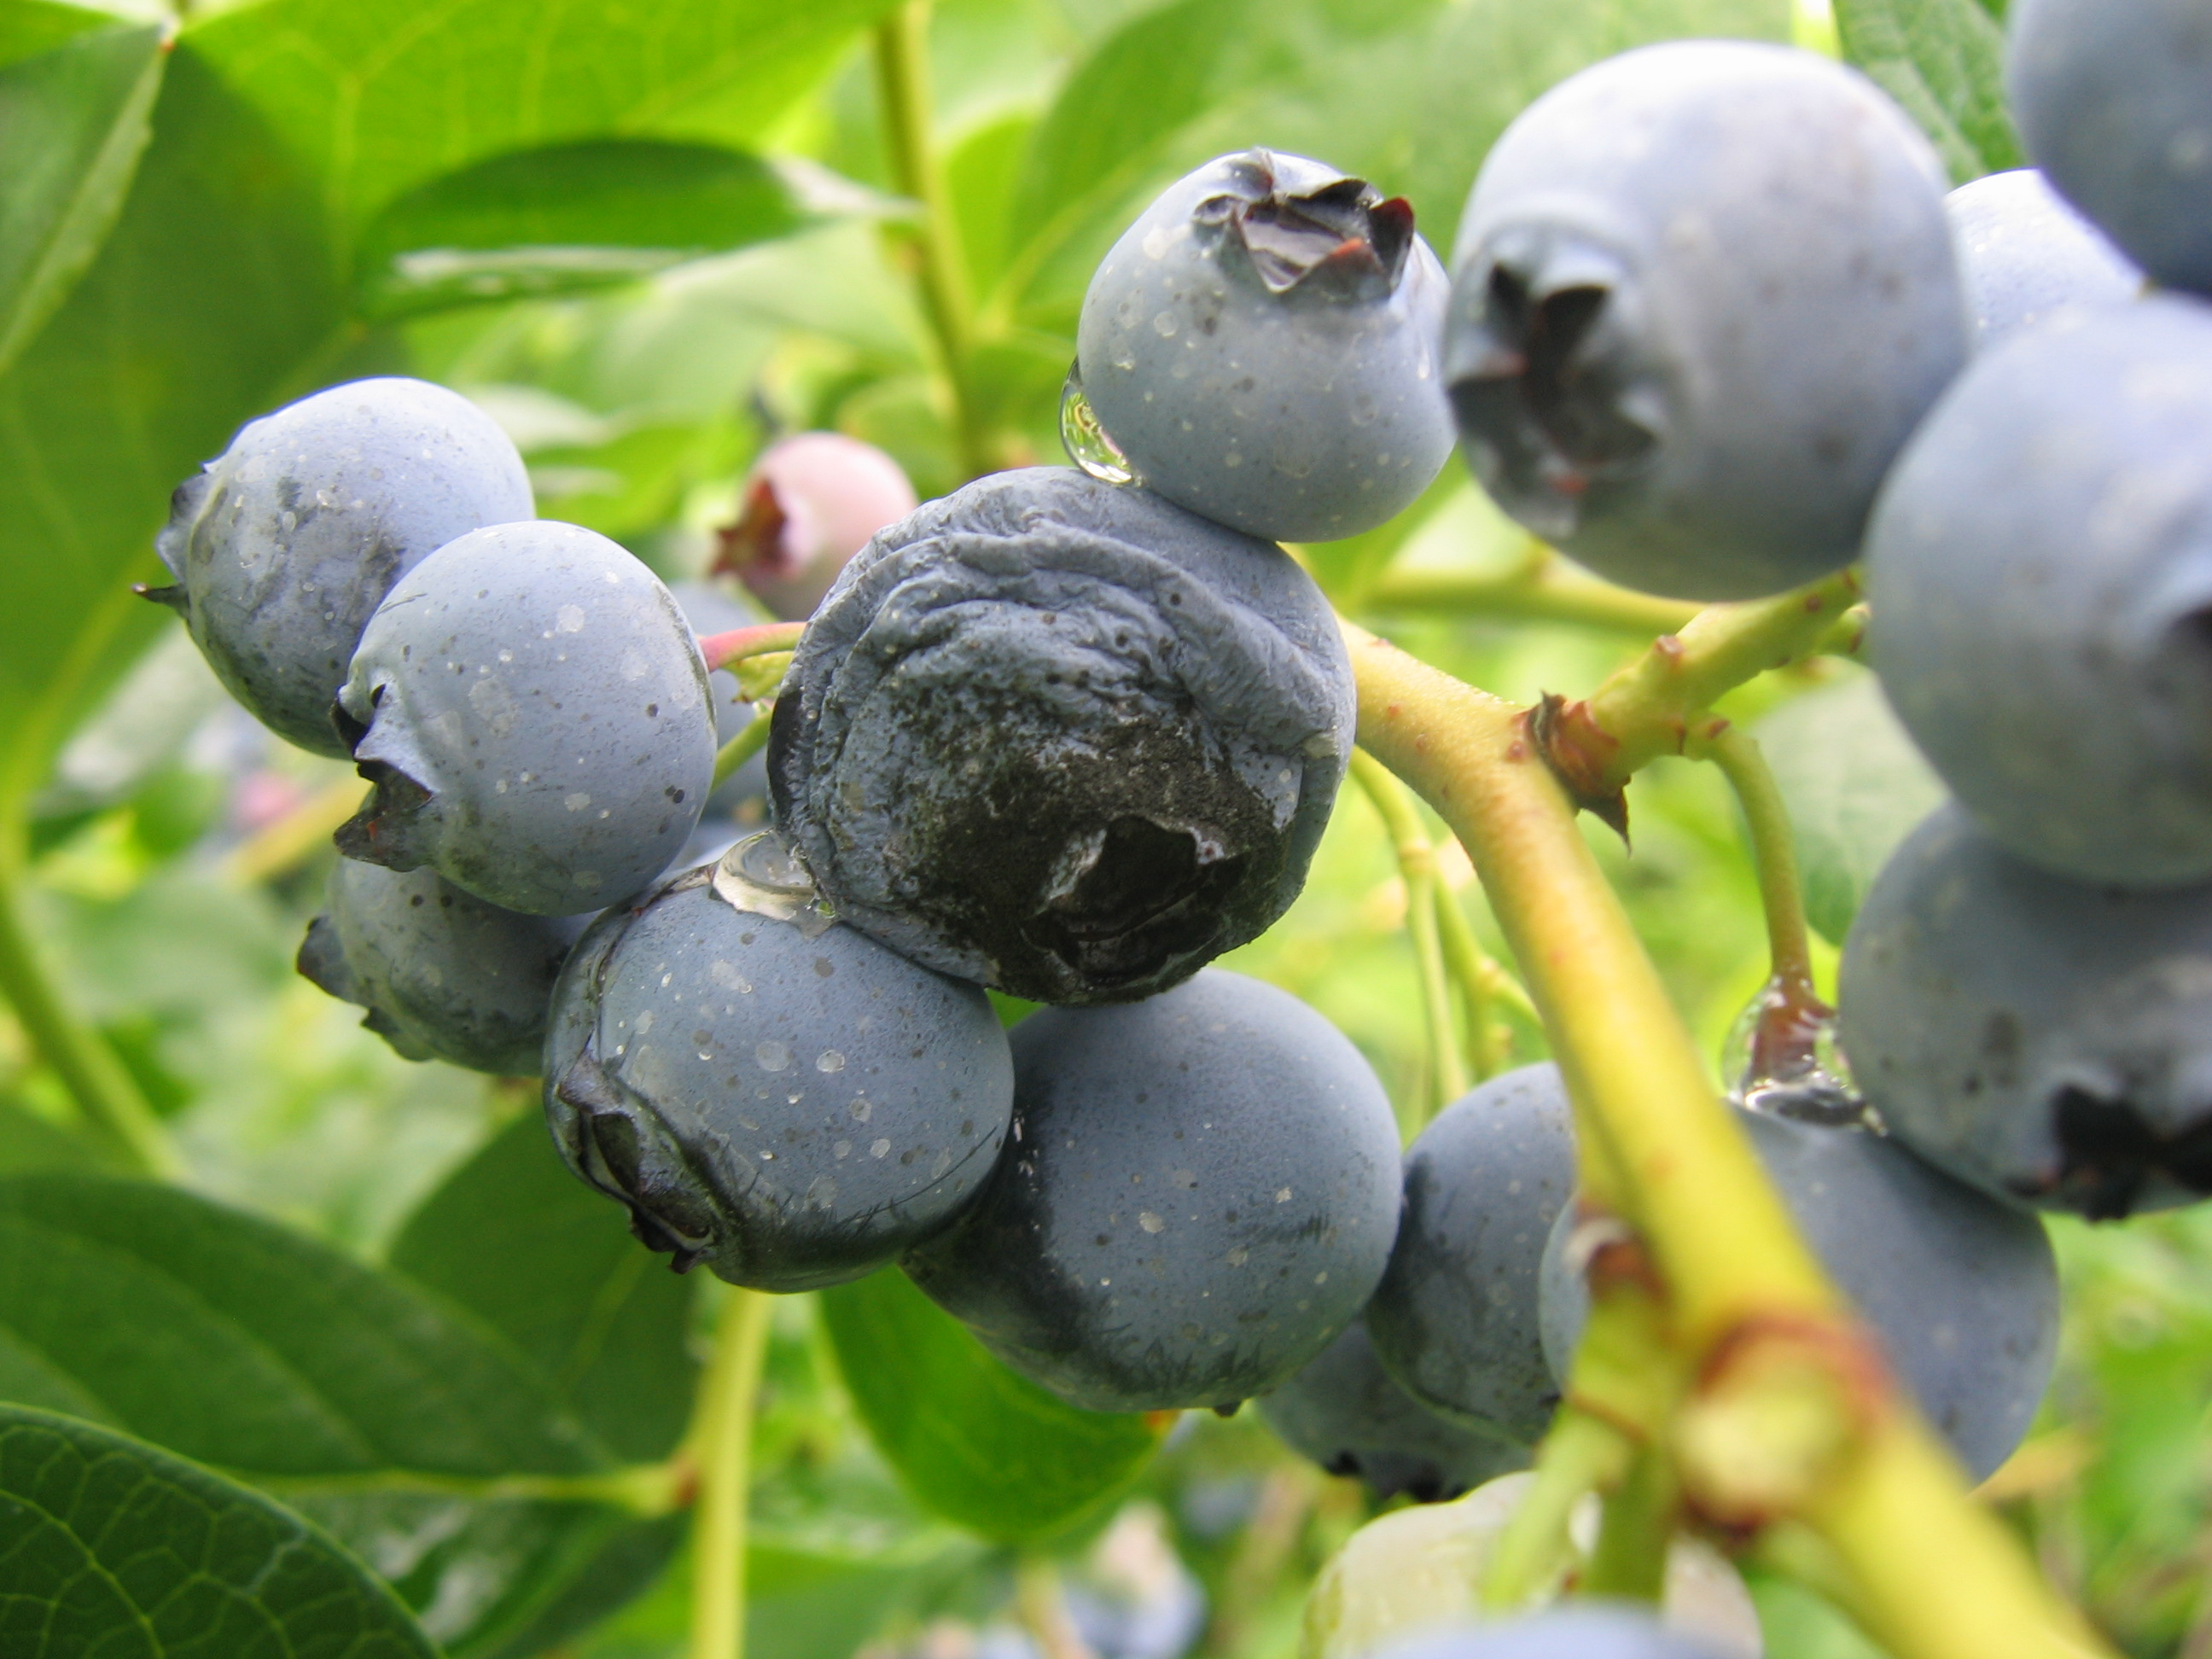 Anthracnose fruit rot